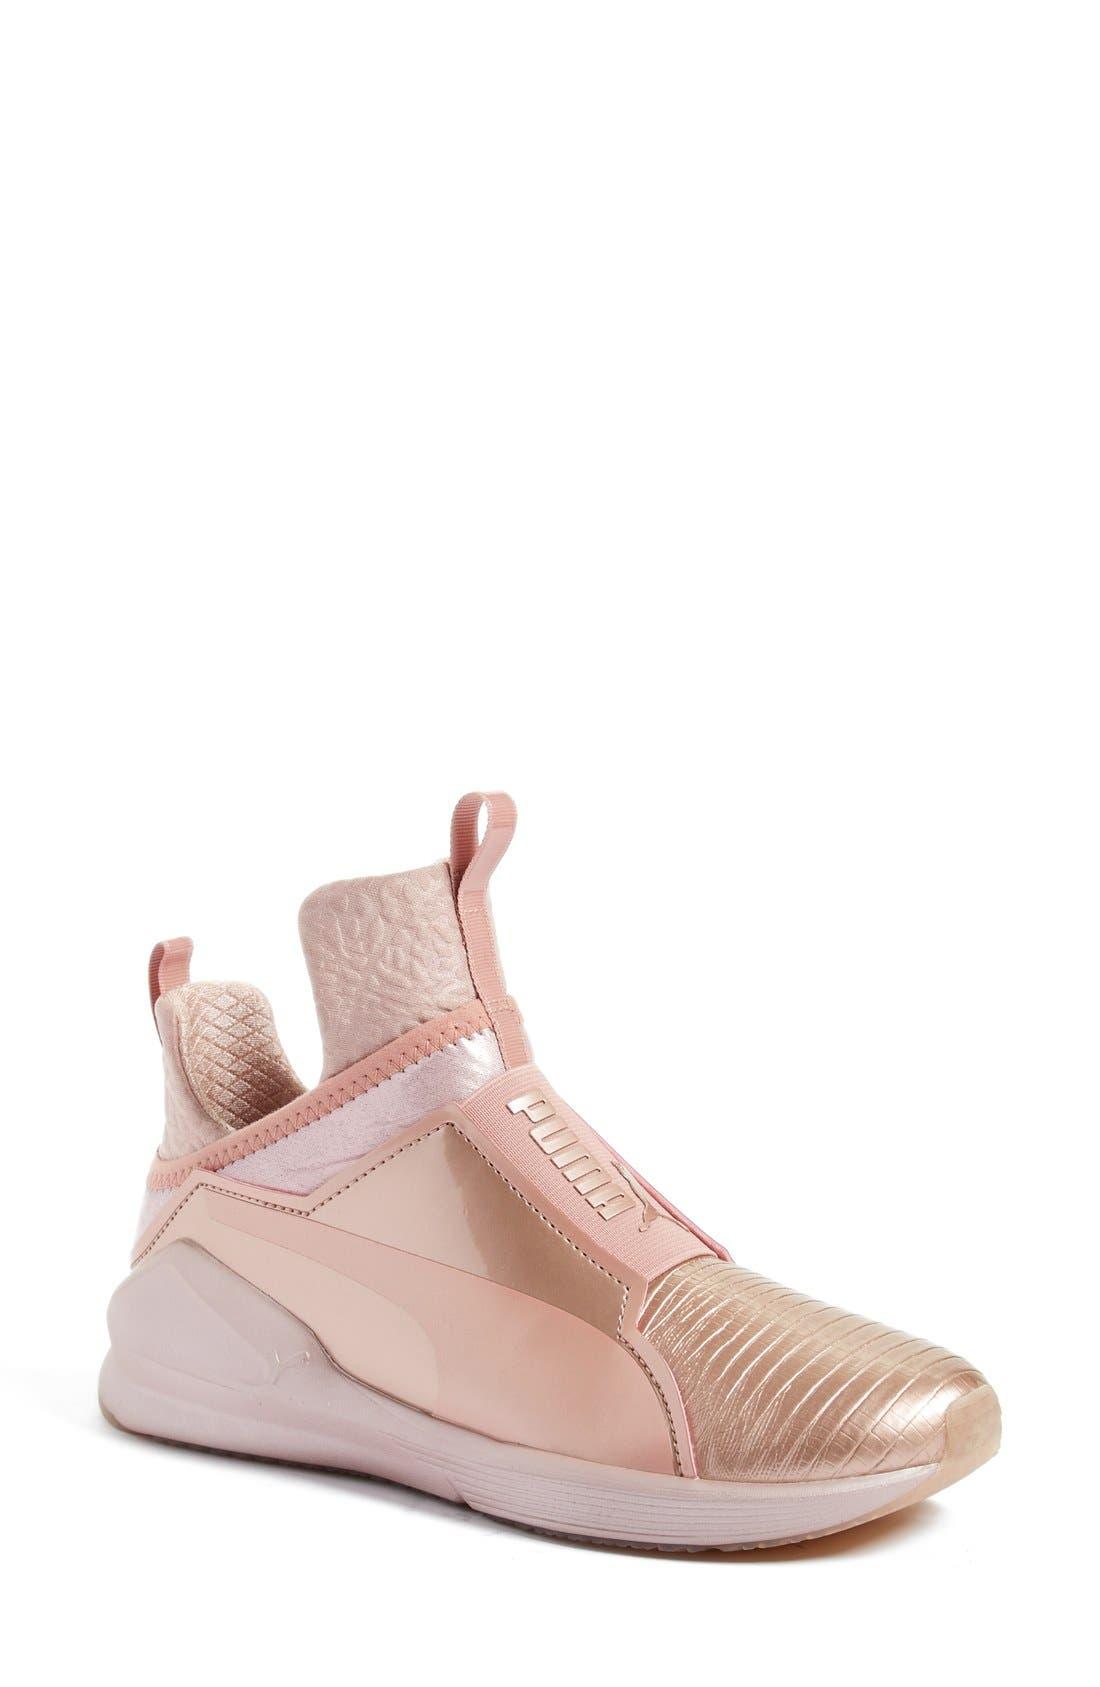 PUMA Fierce Metallic High Top Sneaker (Women)